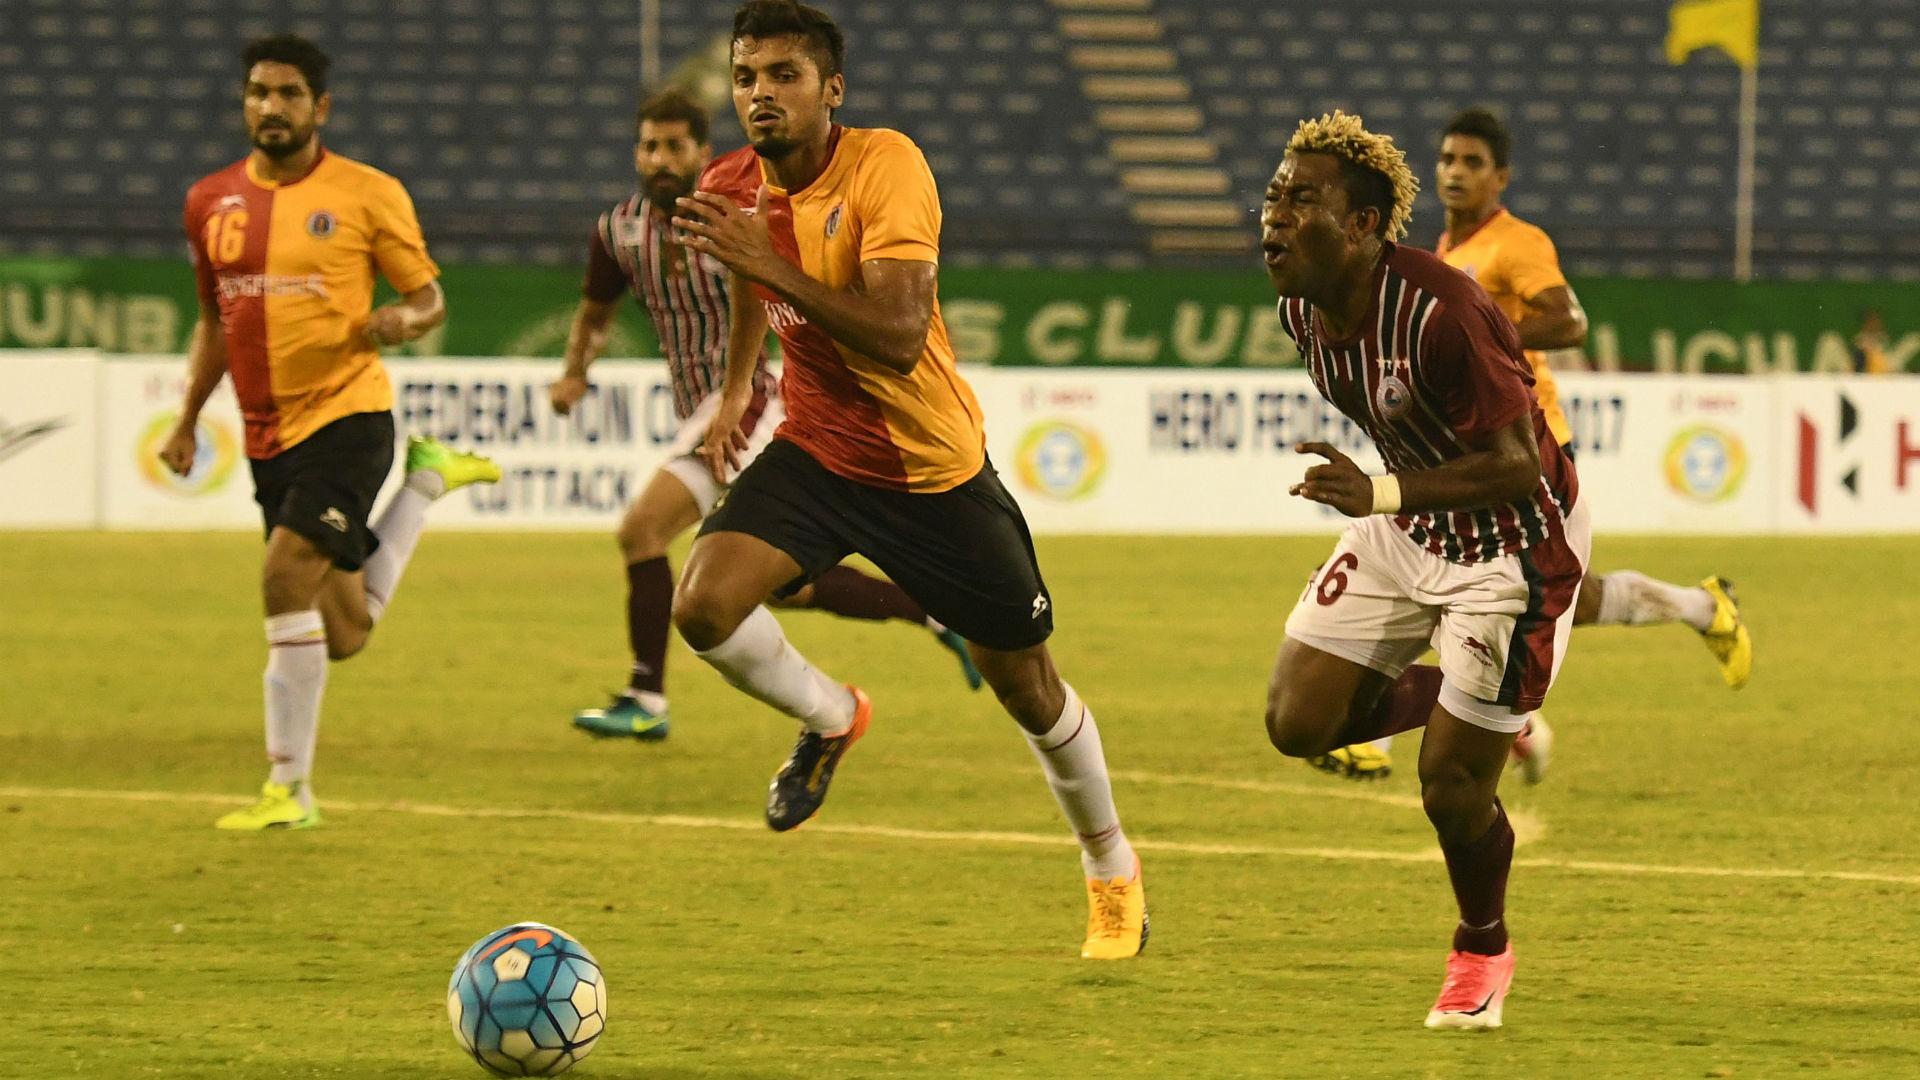 Sony Norde Mohun Bagan East Bengal Federation Cup Semi Final 2017